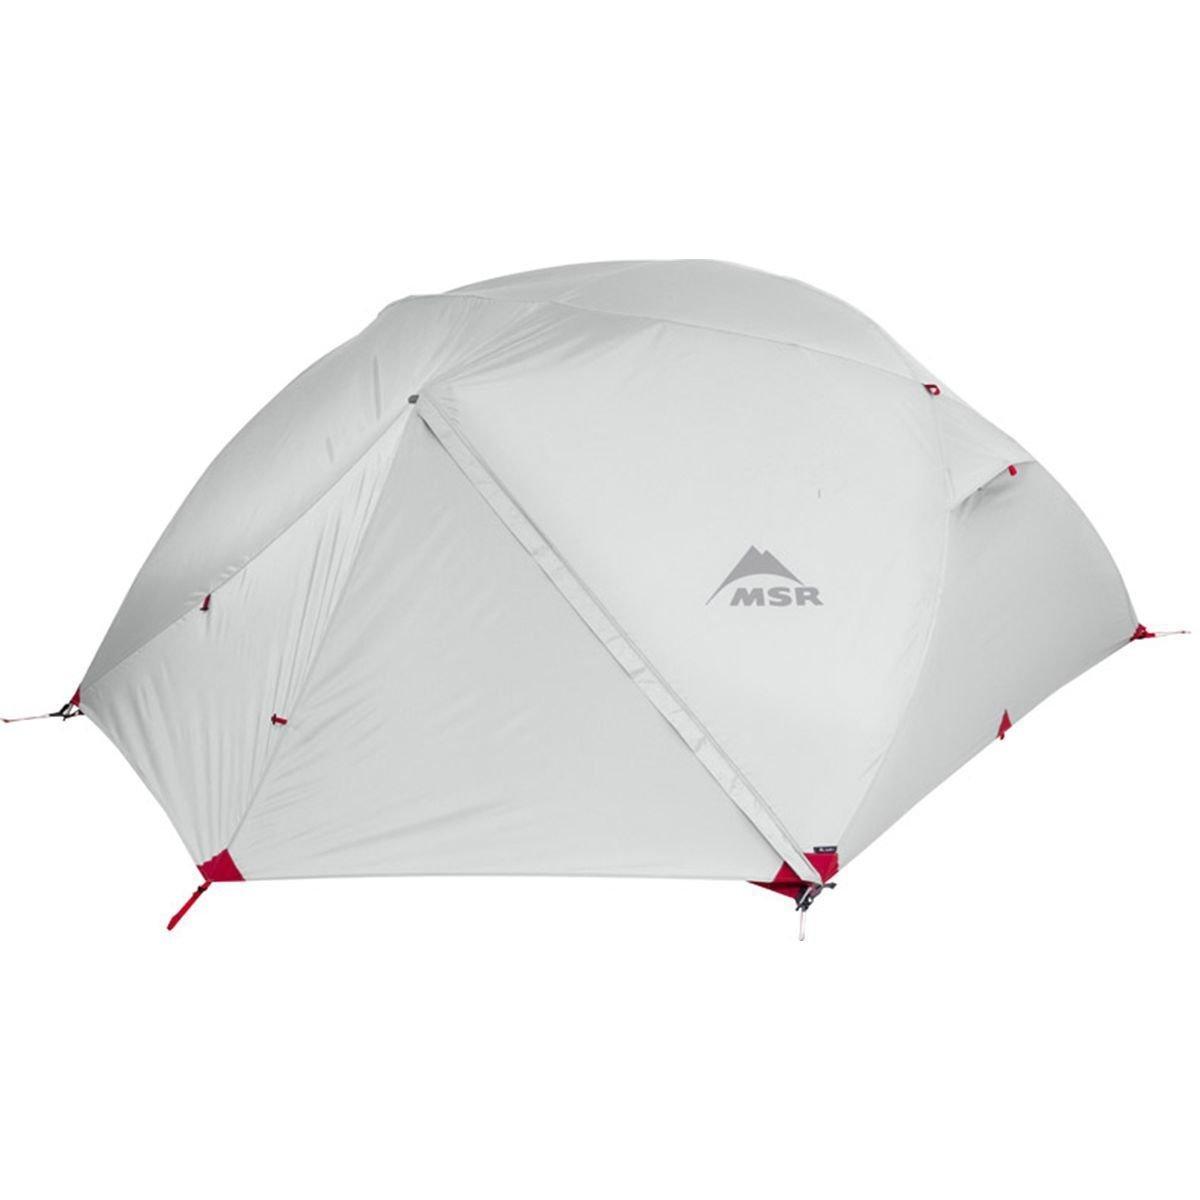 MSR Elixir 4-Person Lightweight Backpacking Tent by MSR (Image #2)